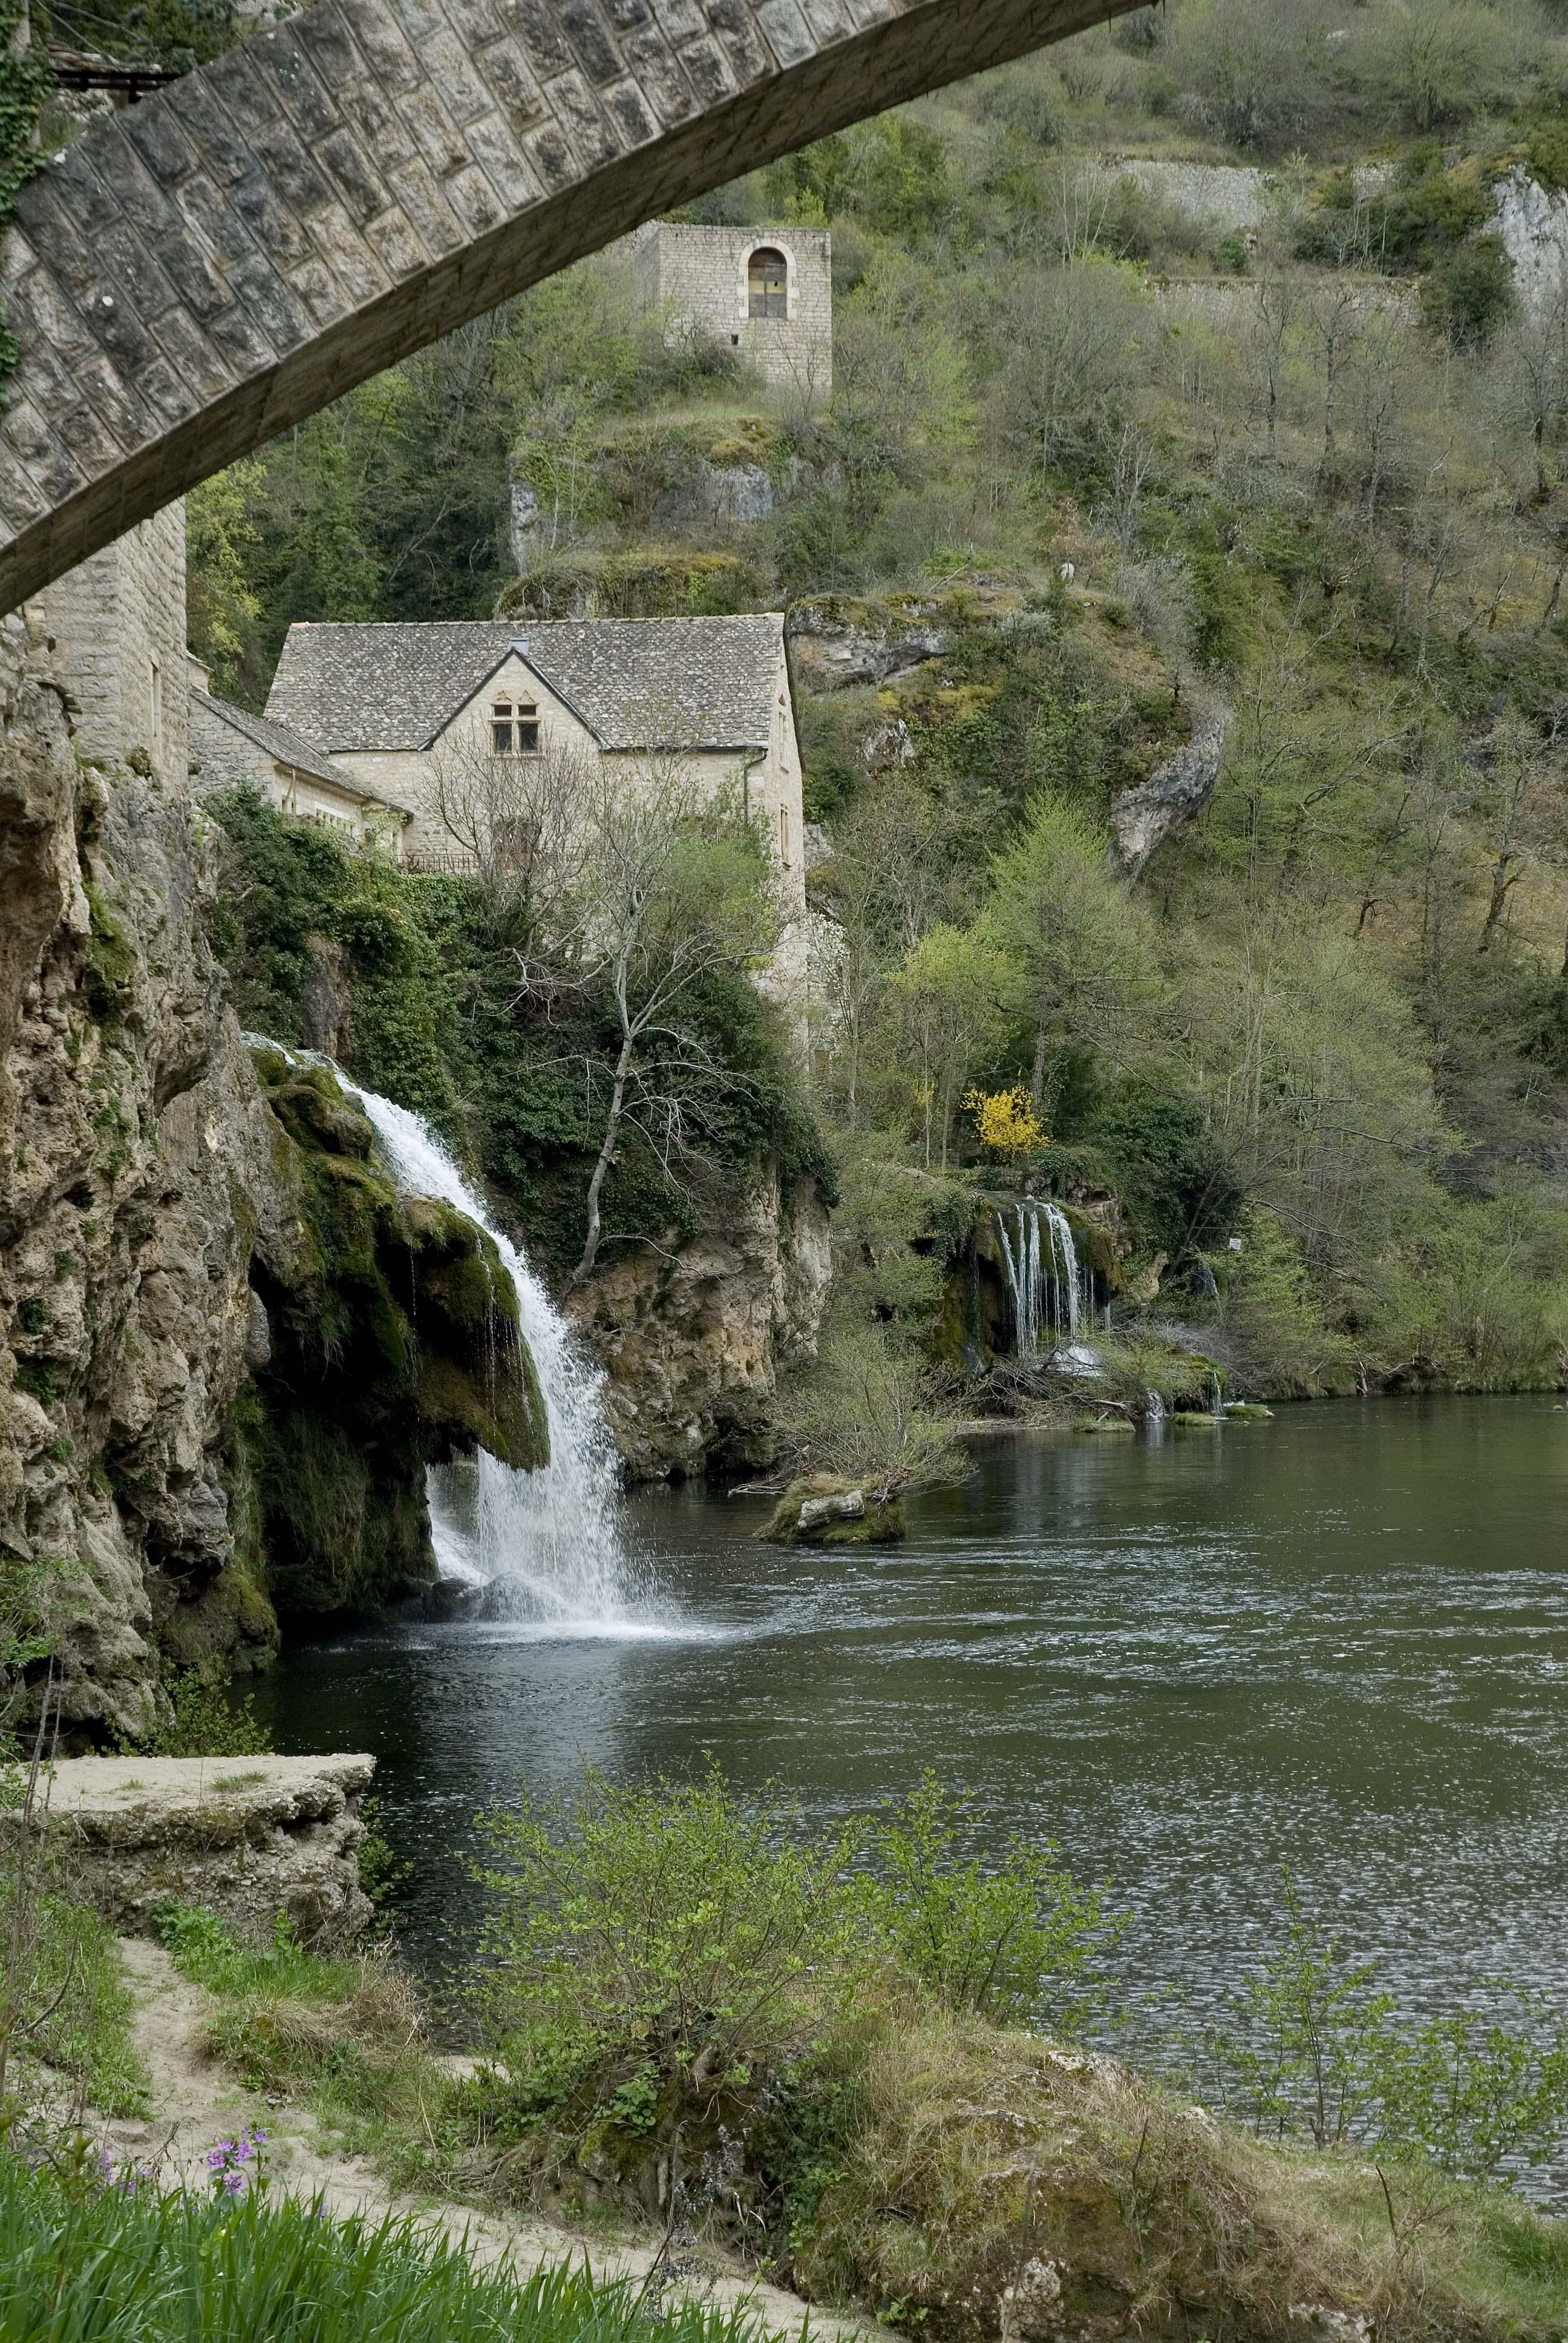 _JF12694-Gorges du Tarn-St Ch_ly du Tarn